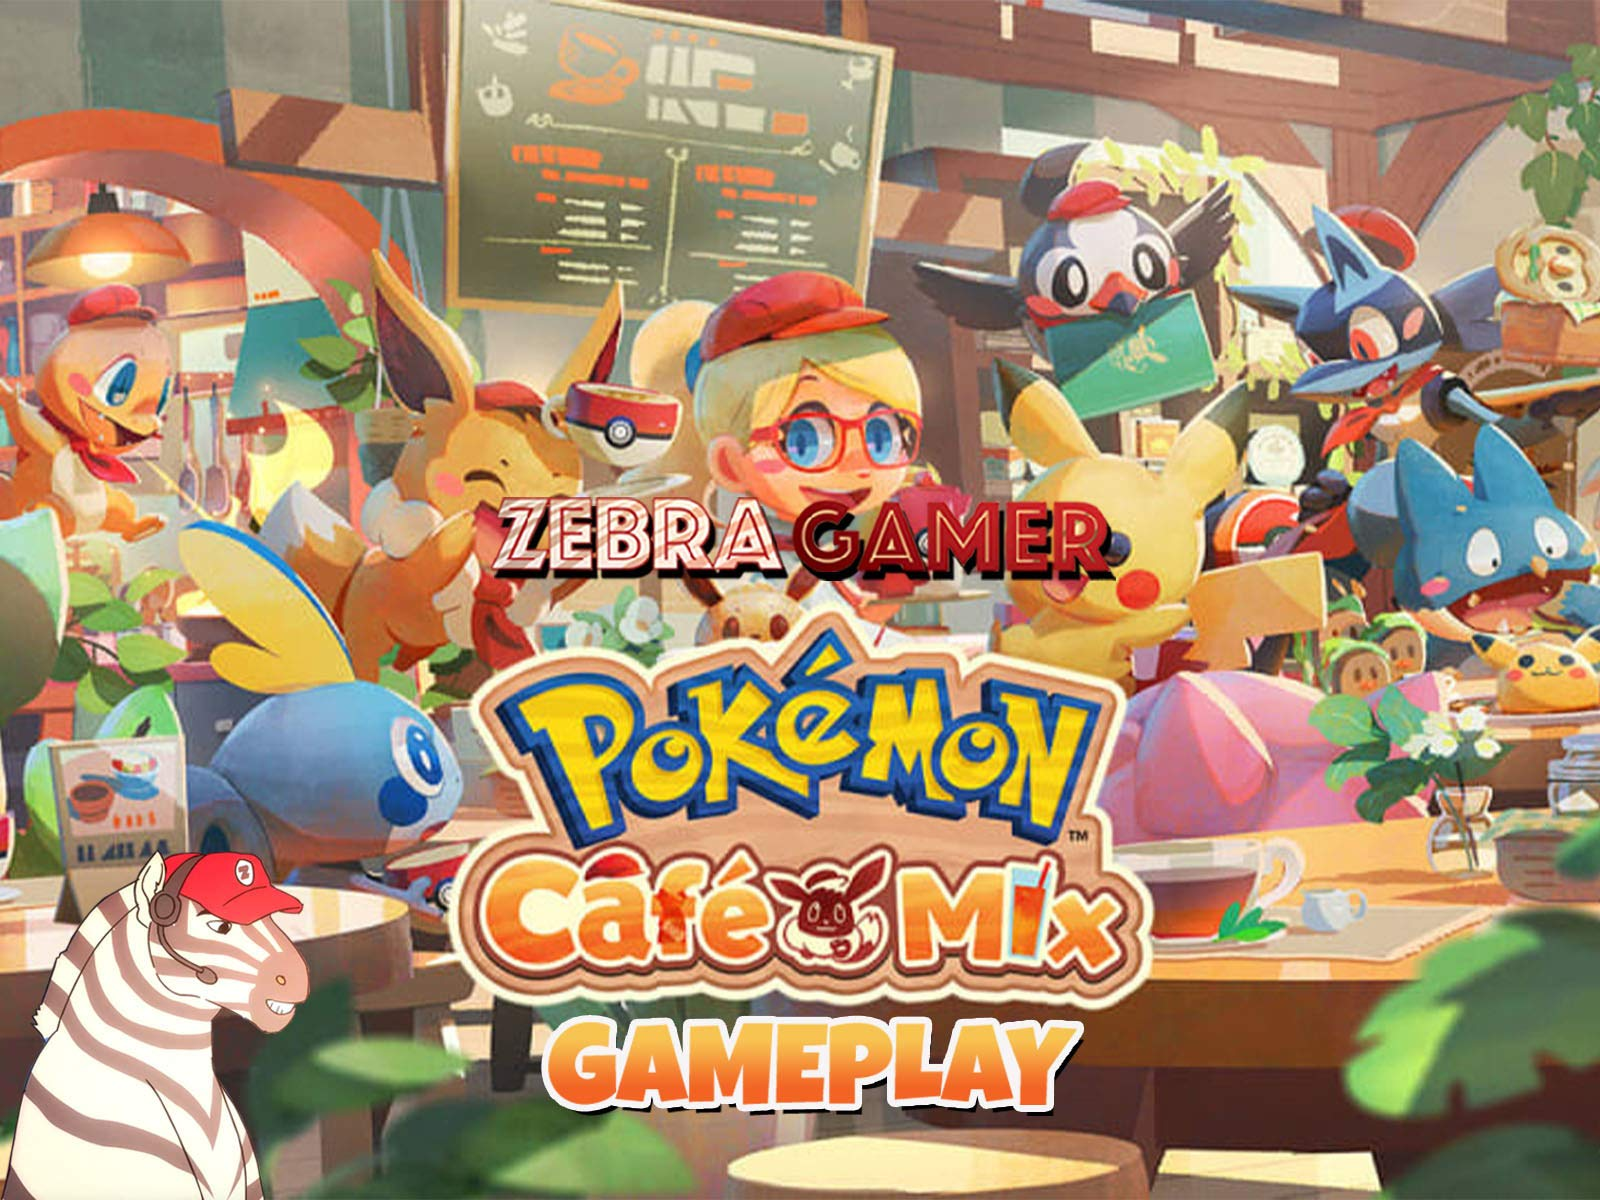 Clip: Pokemon Cafe Mix Gameplay - Zebra Gamer - Season 1